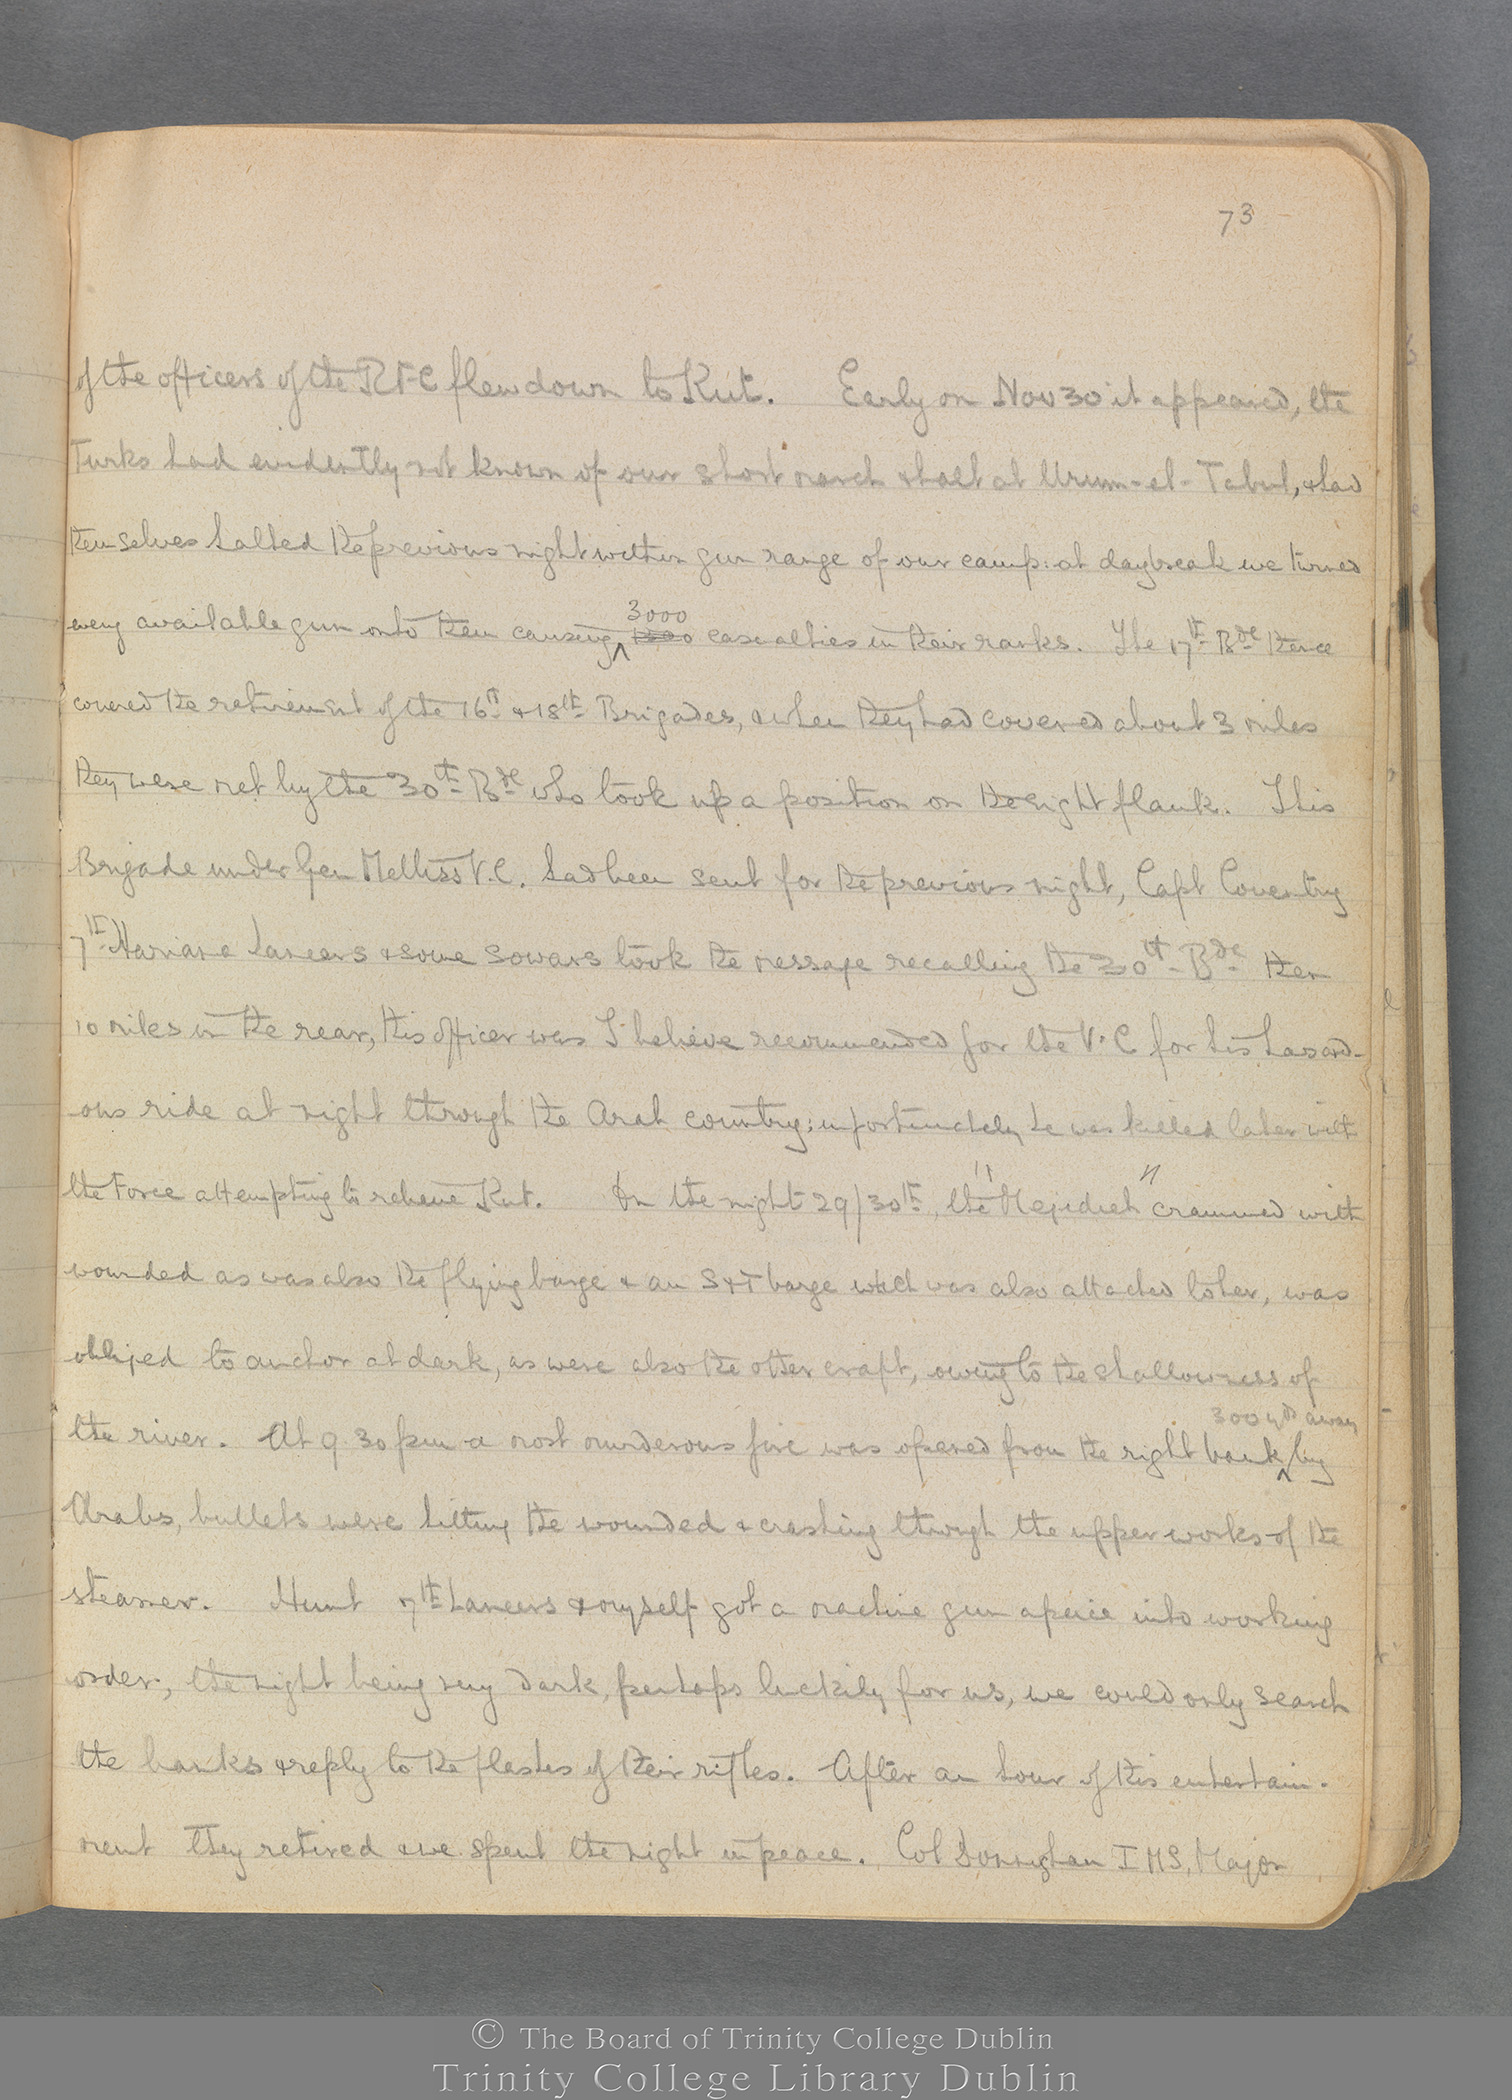 TCD MS 3414 folio 73 recto